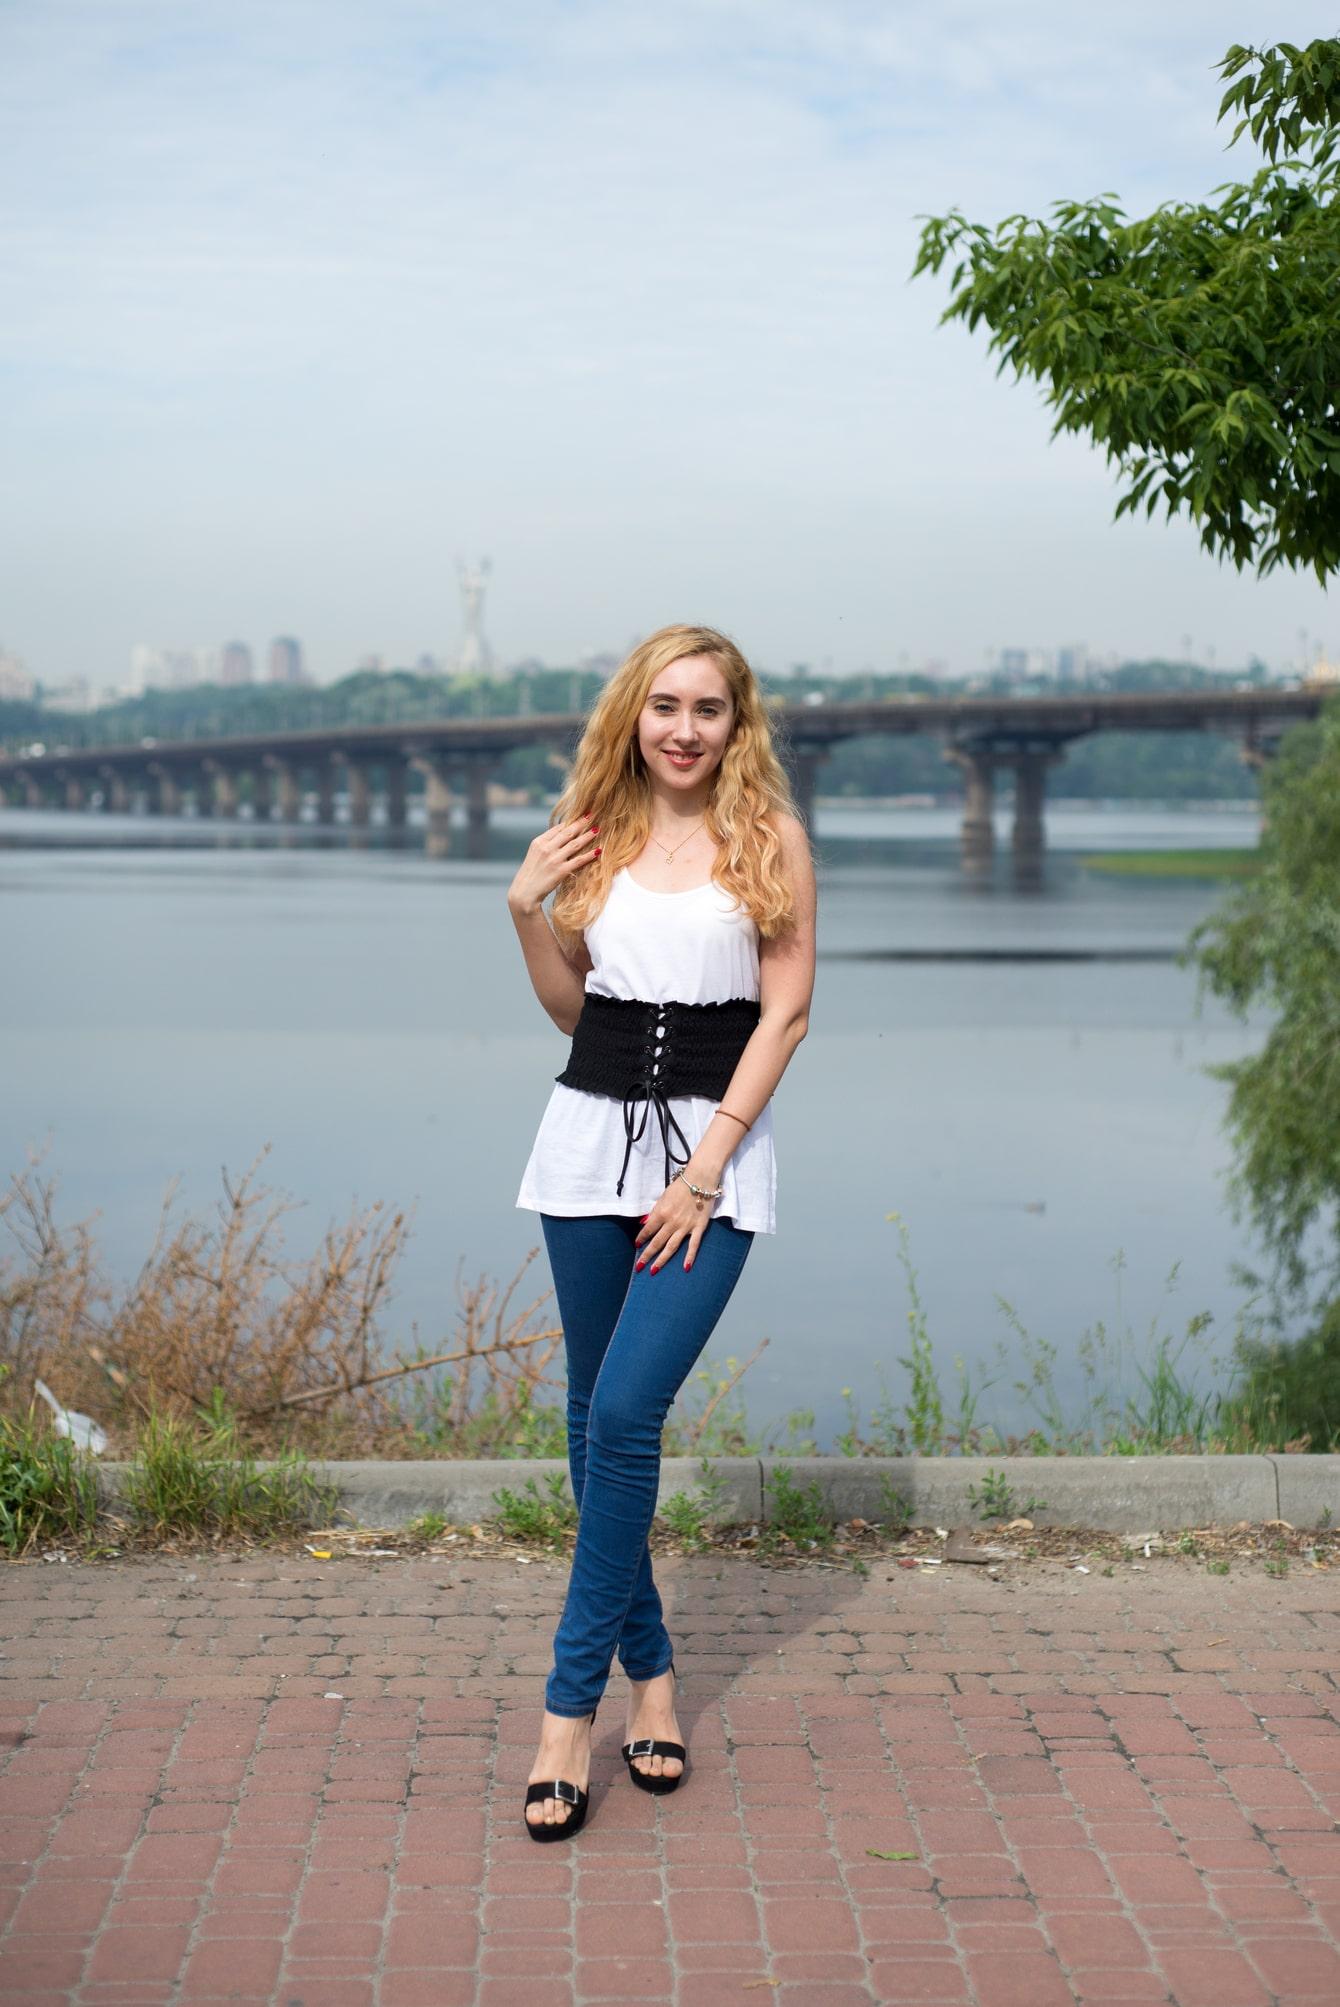 Аня на набережной Днепра - Фотограф Женя Лайт